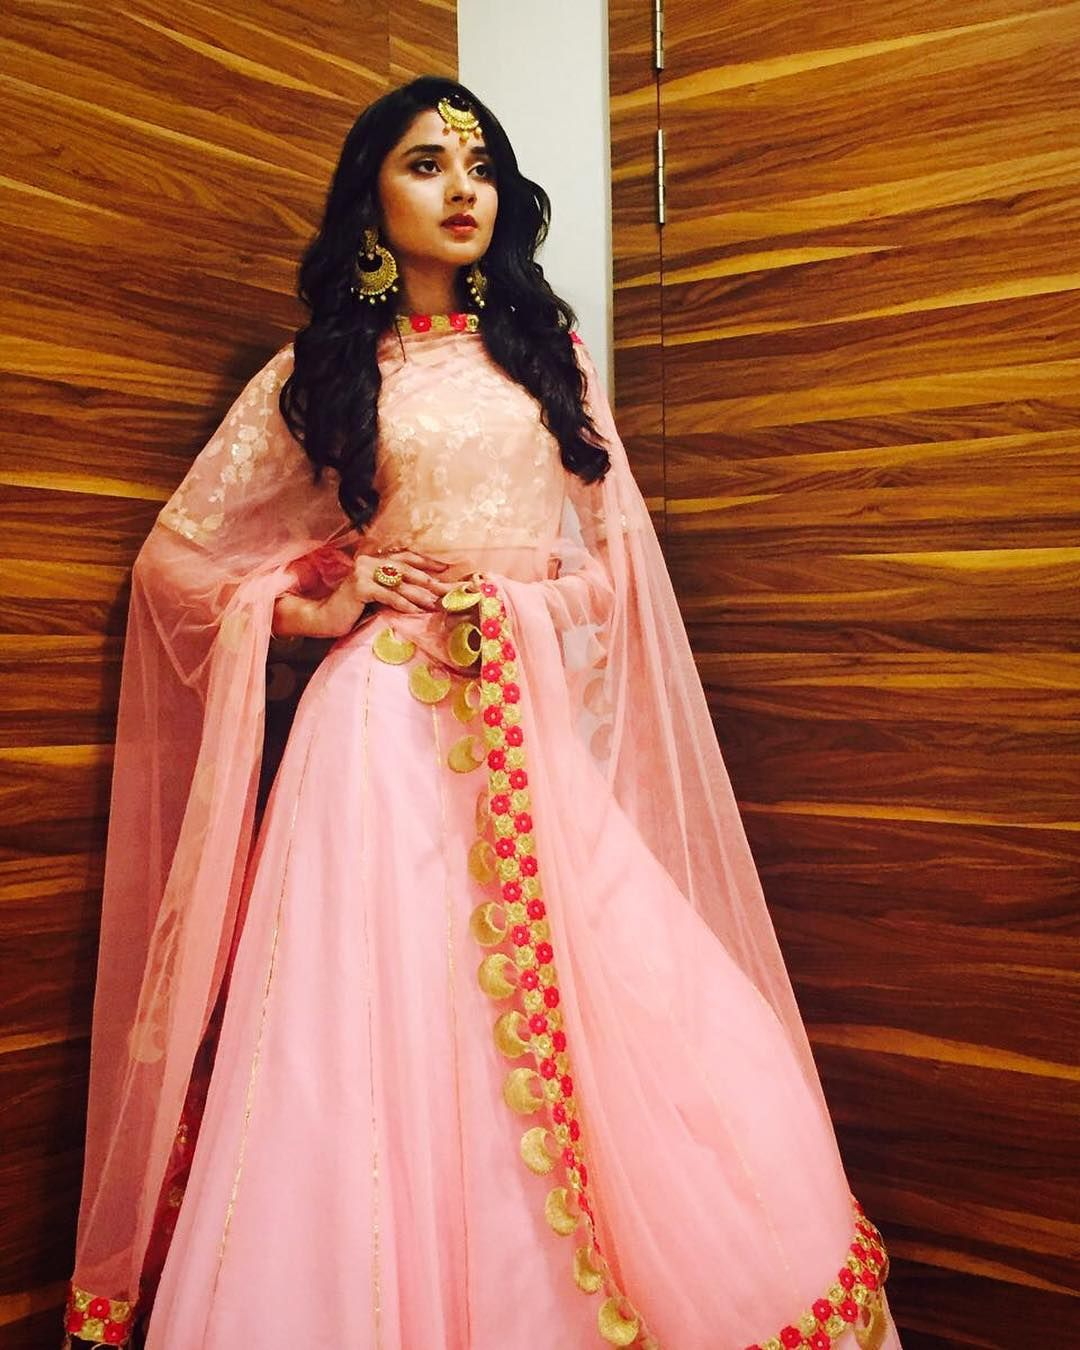 Kay fashions in bangalore dating